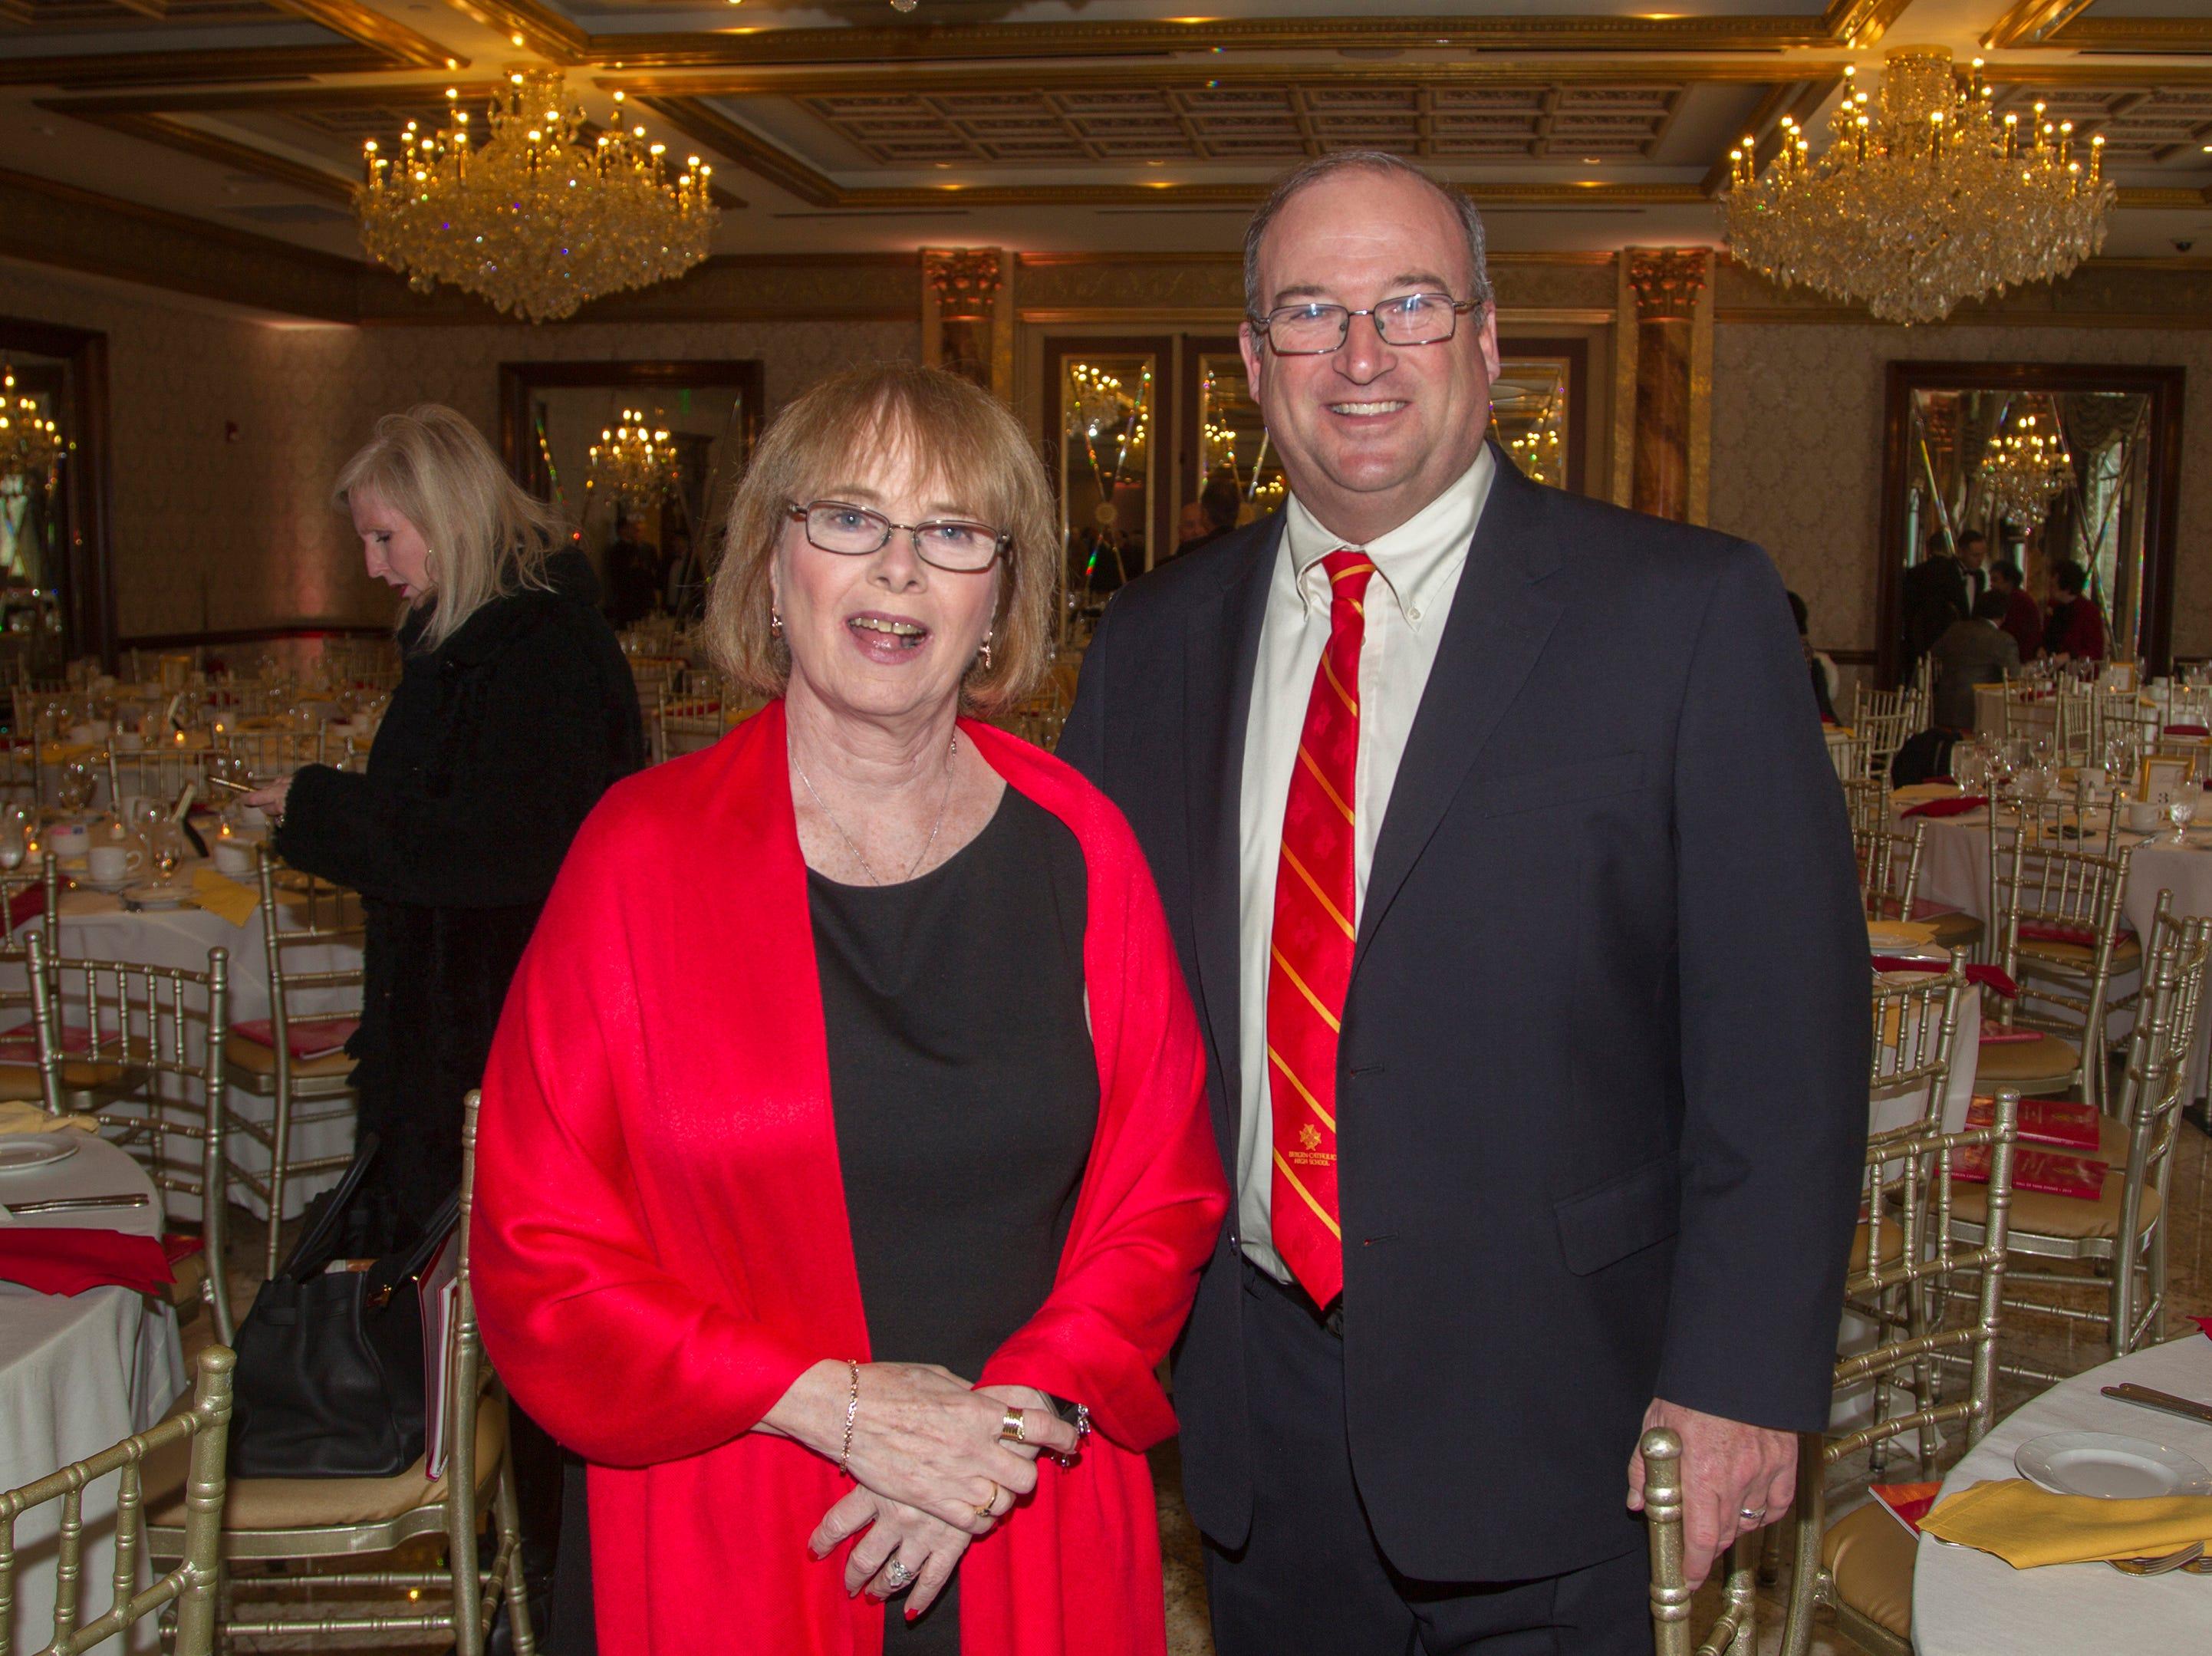 Regina Ardoslovich, Tim McElhinney. Bergen Catholic High School Hall of Fame Dinner at Seasons in Washington Twp. 03/31/2019